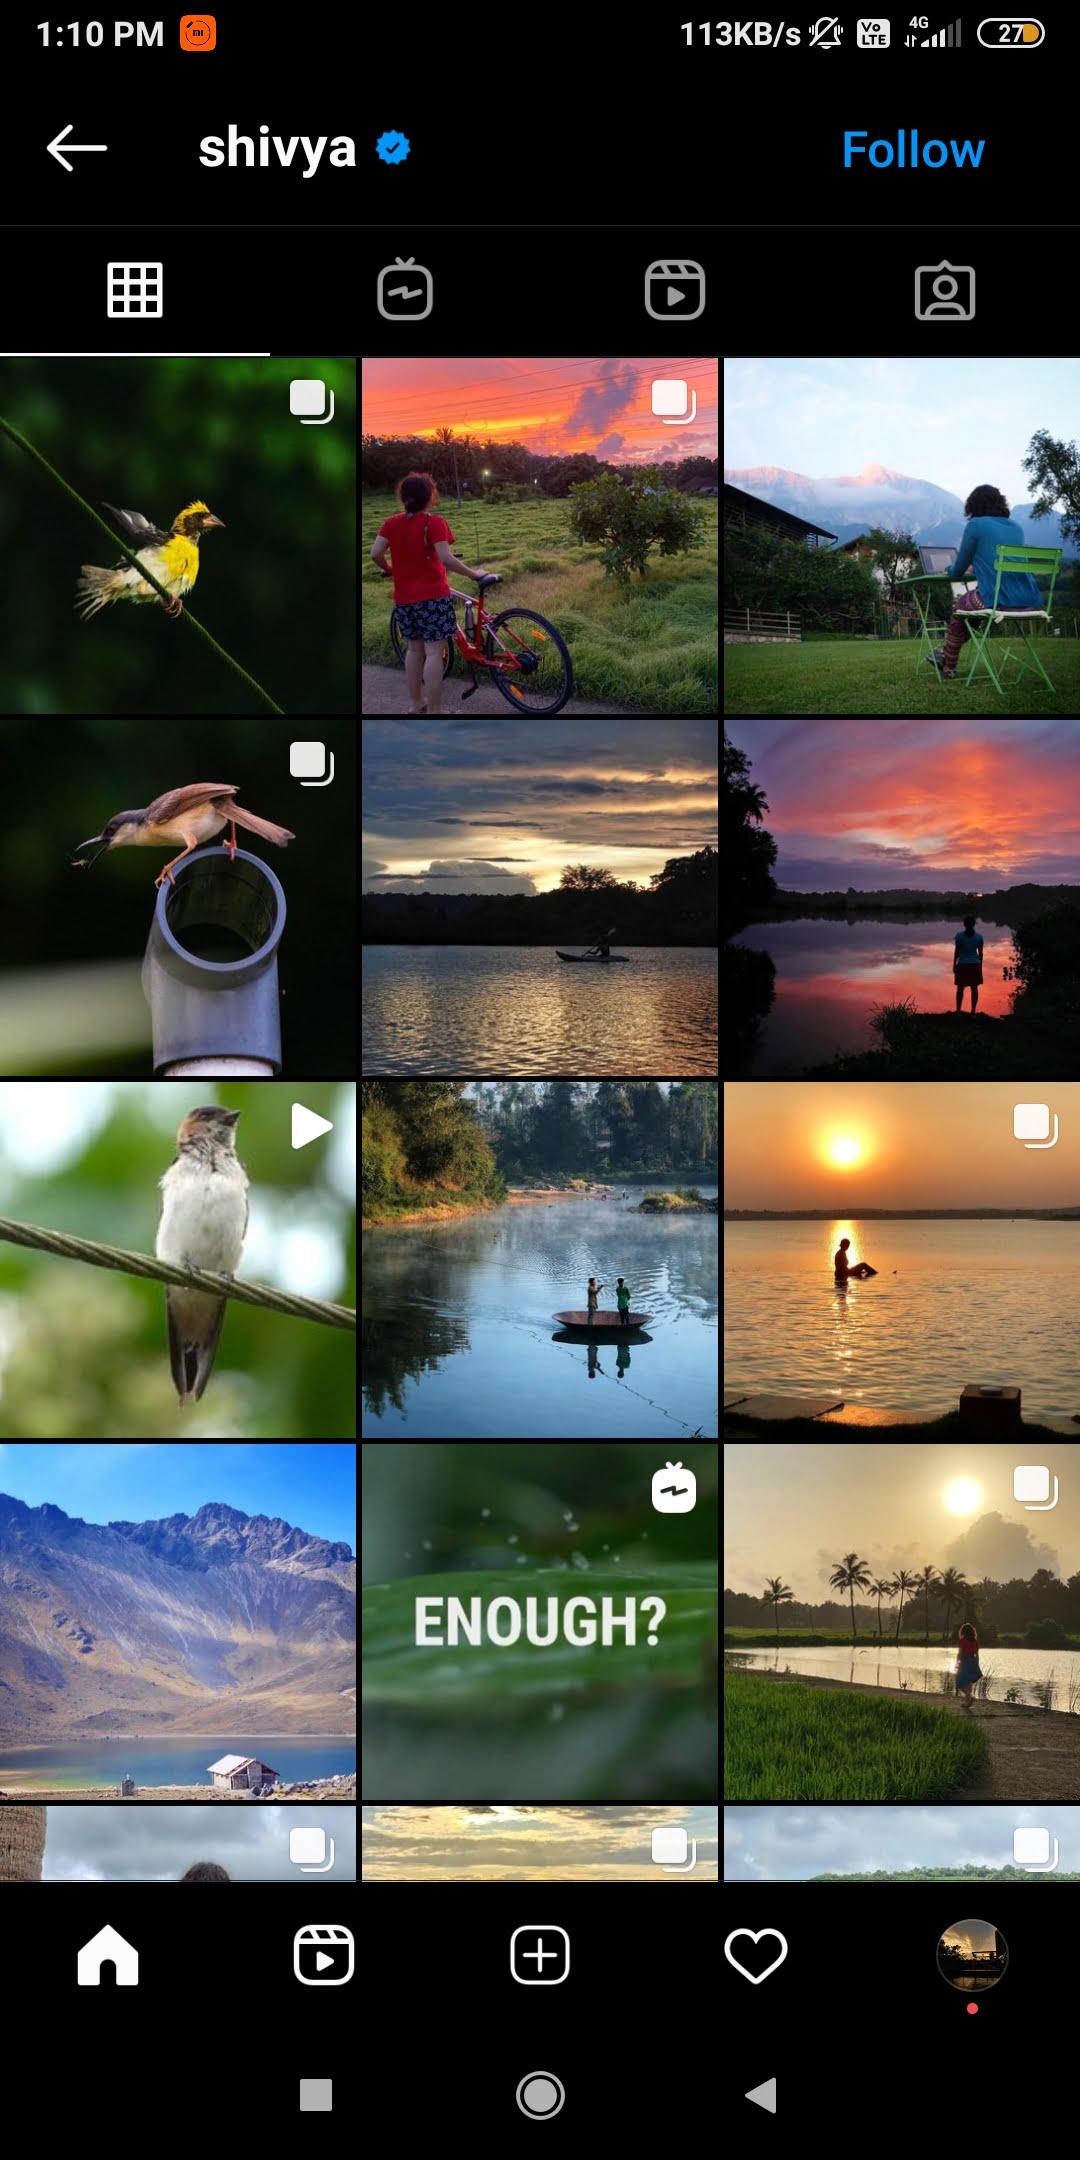 @shivya  -  shivya - 43 Best PHOTOGRAPHY Instagram Accounts  – PHOTOGRAPHERS to Follow Right Now